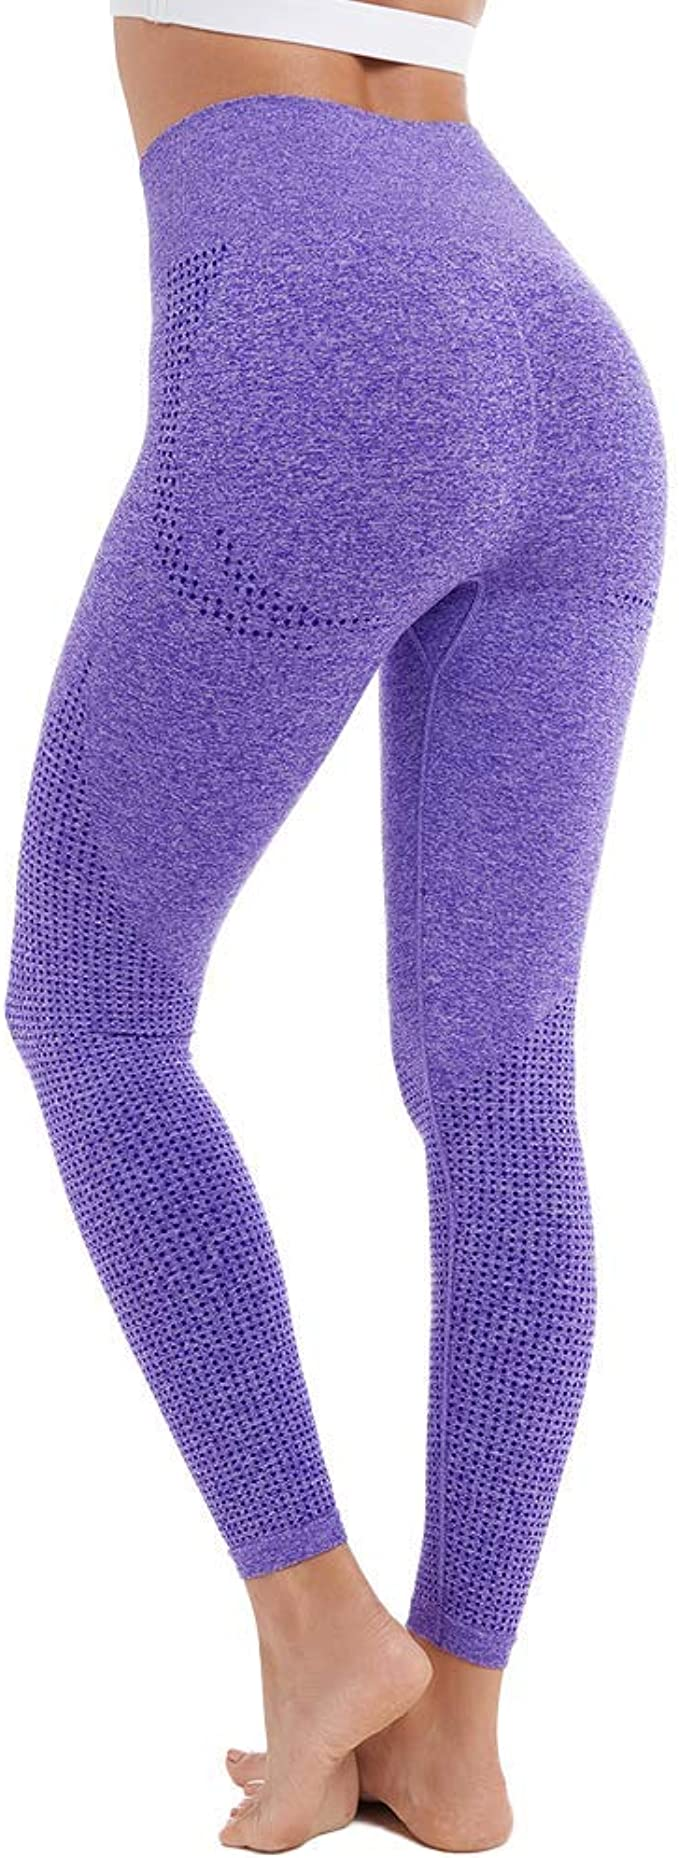 Hight Waist Yoga Pants for Women Seamless Leggings Tummy Control Tights Squat Proof